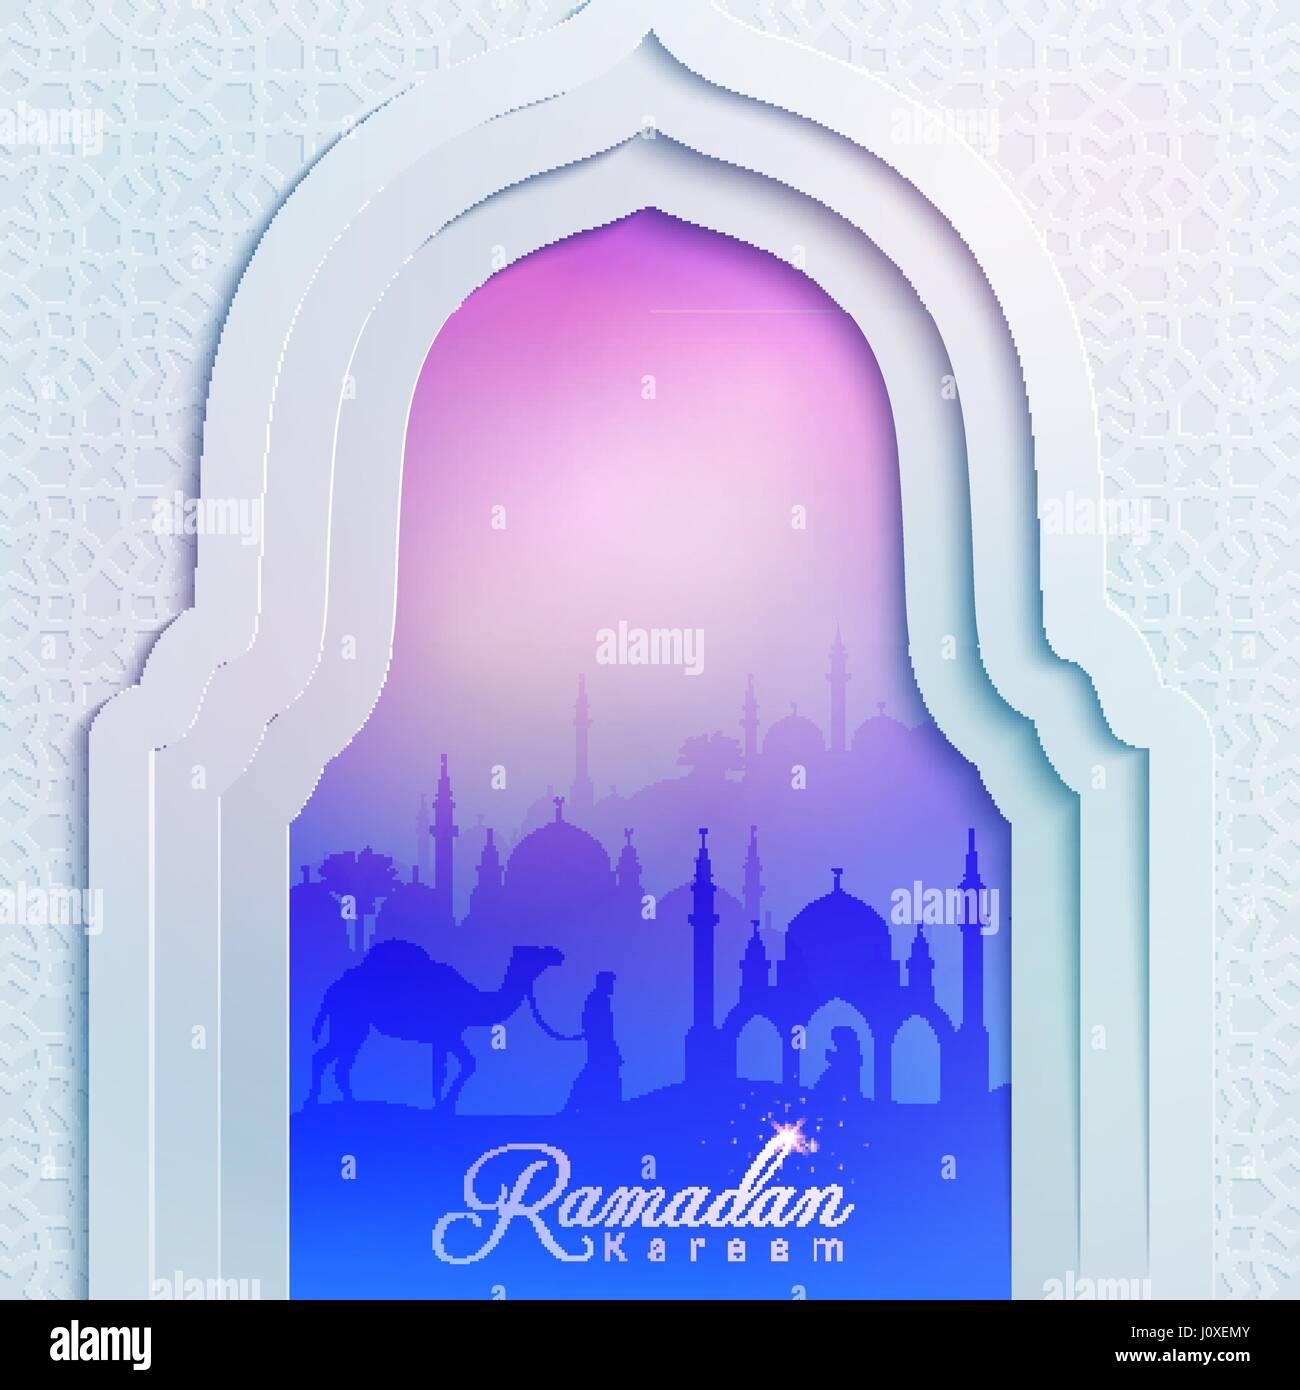 Mosque background for ramadan kareem stock photography image - Islamic Design Background Mosque Door Ramadan Kareem